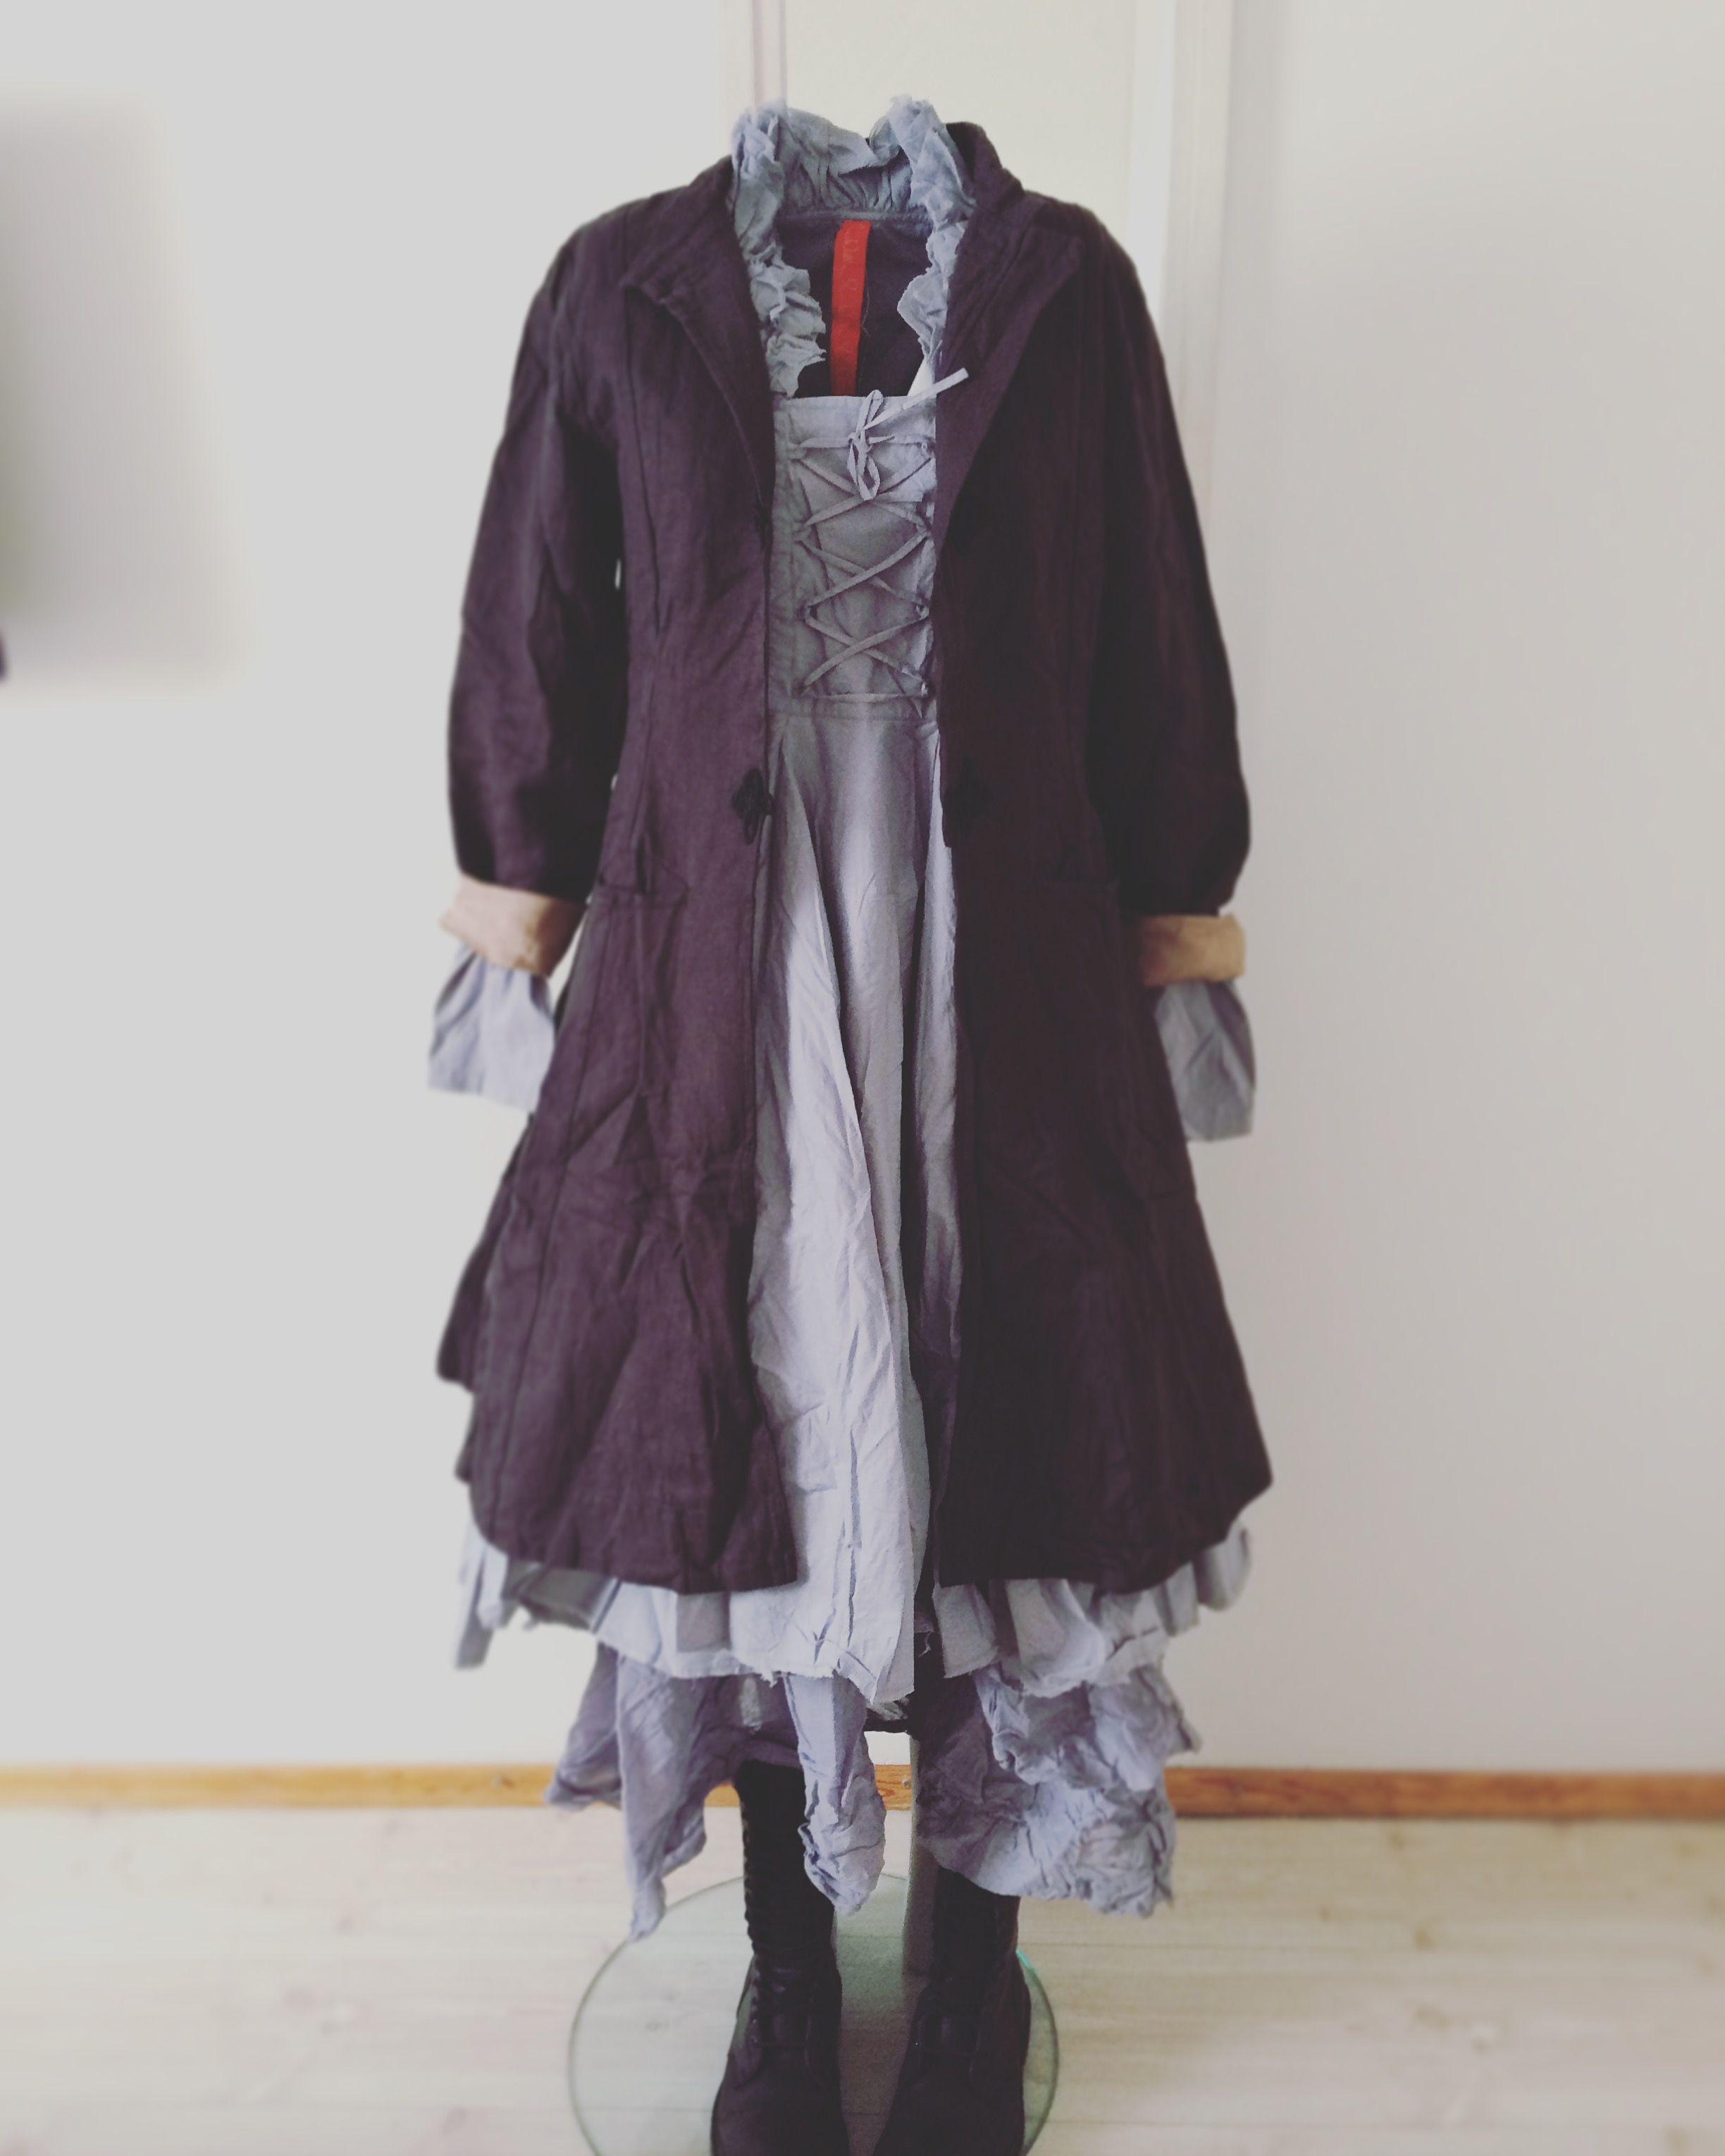 Awesome Shabby Chic Clothing Style